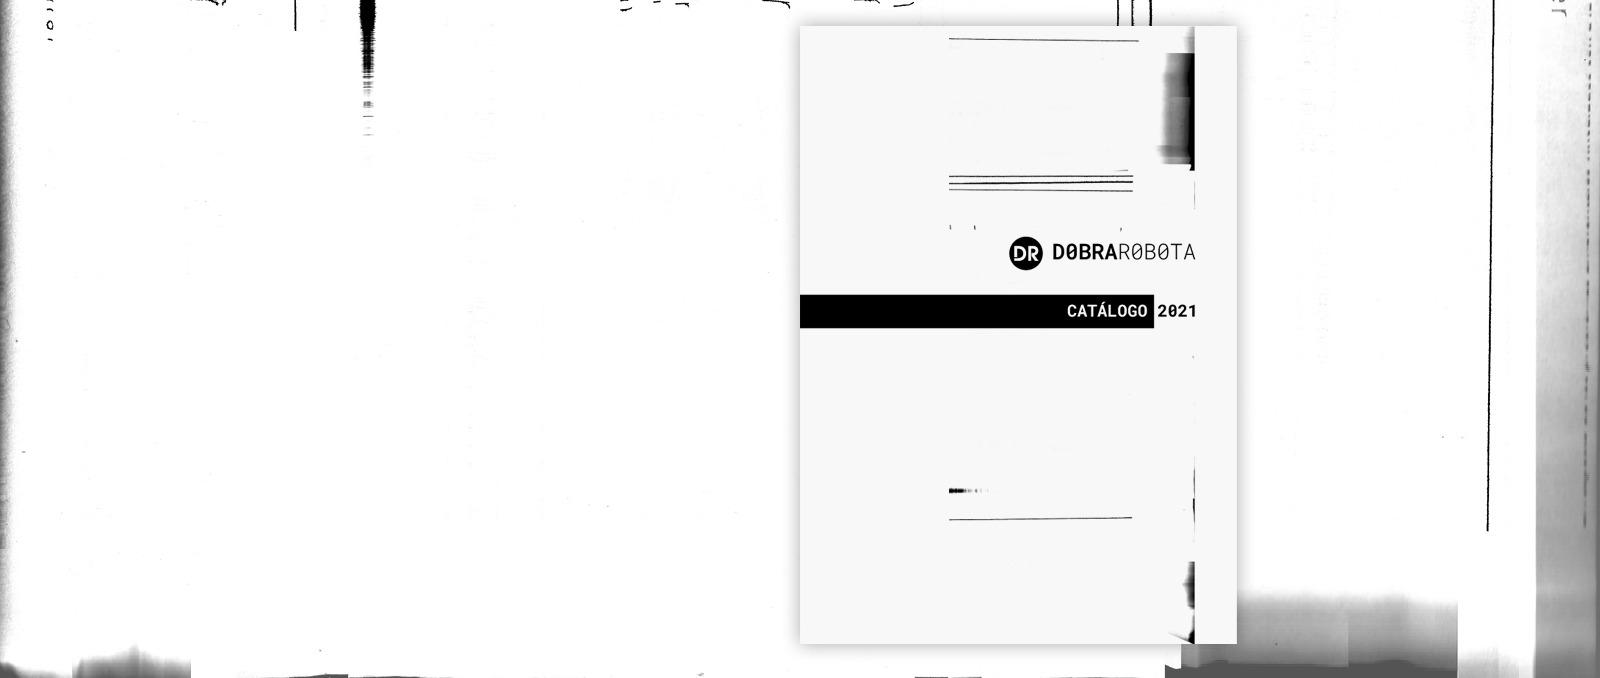 bnn-dobra2-desktop